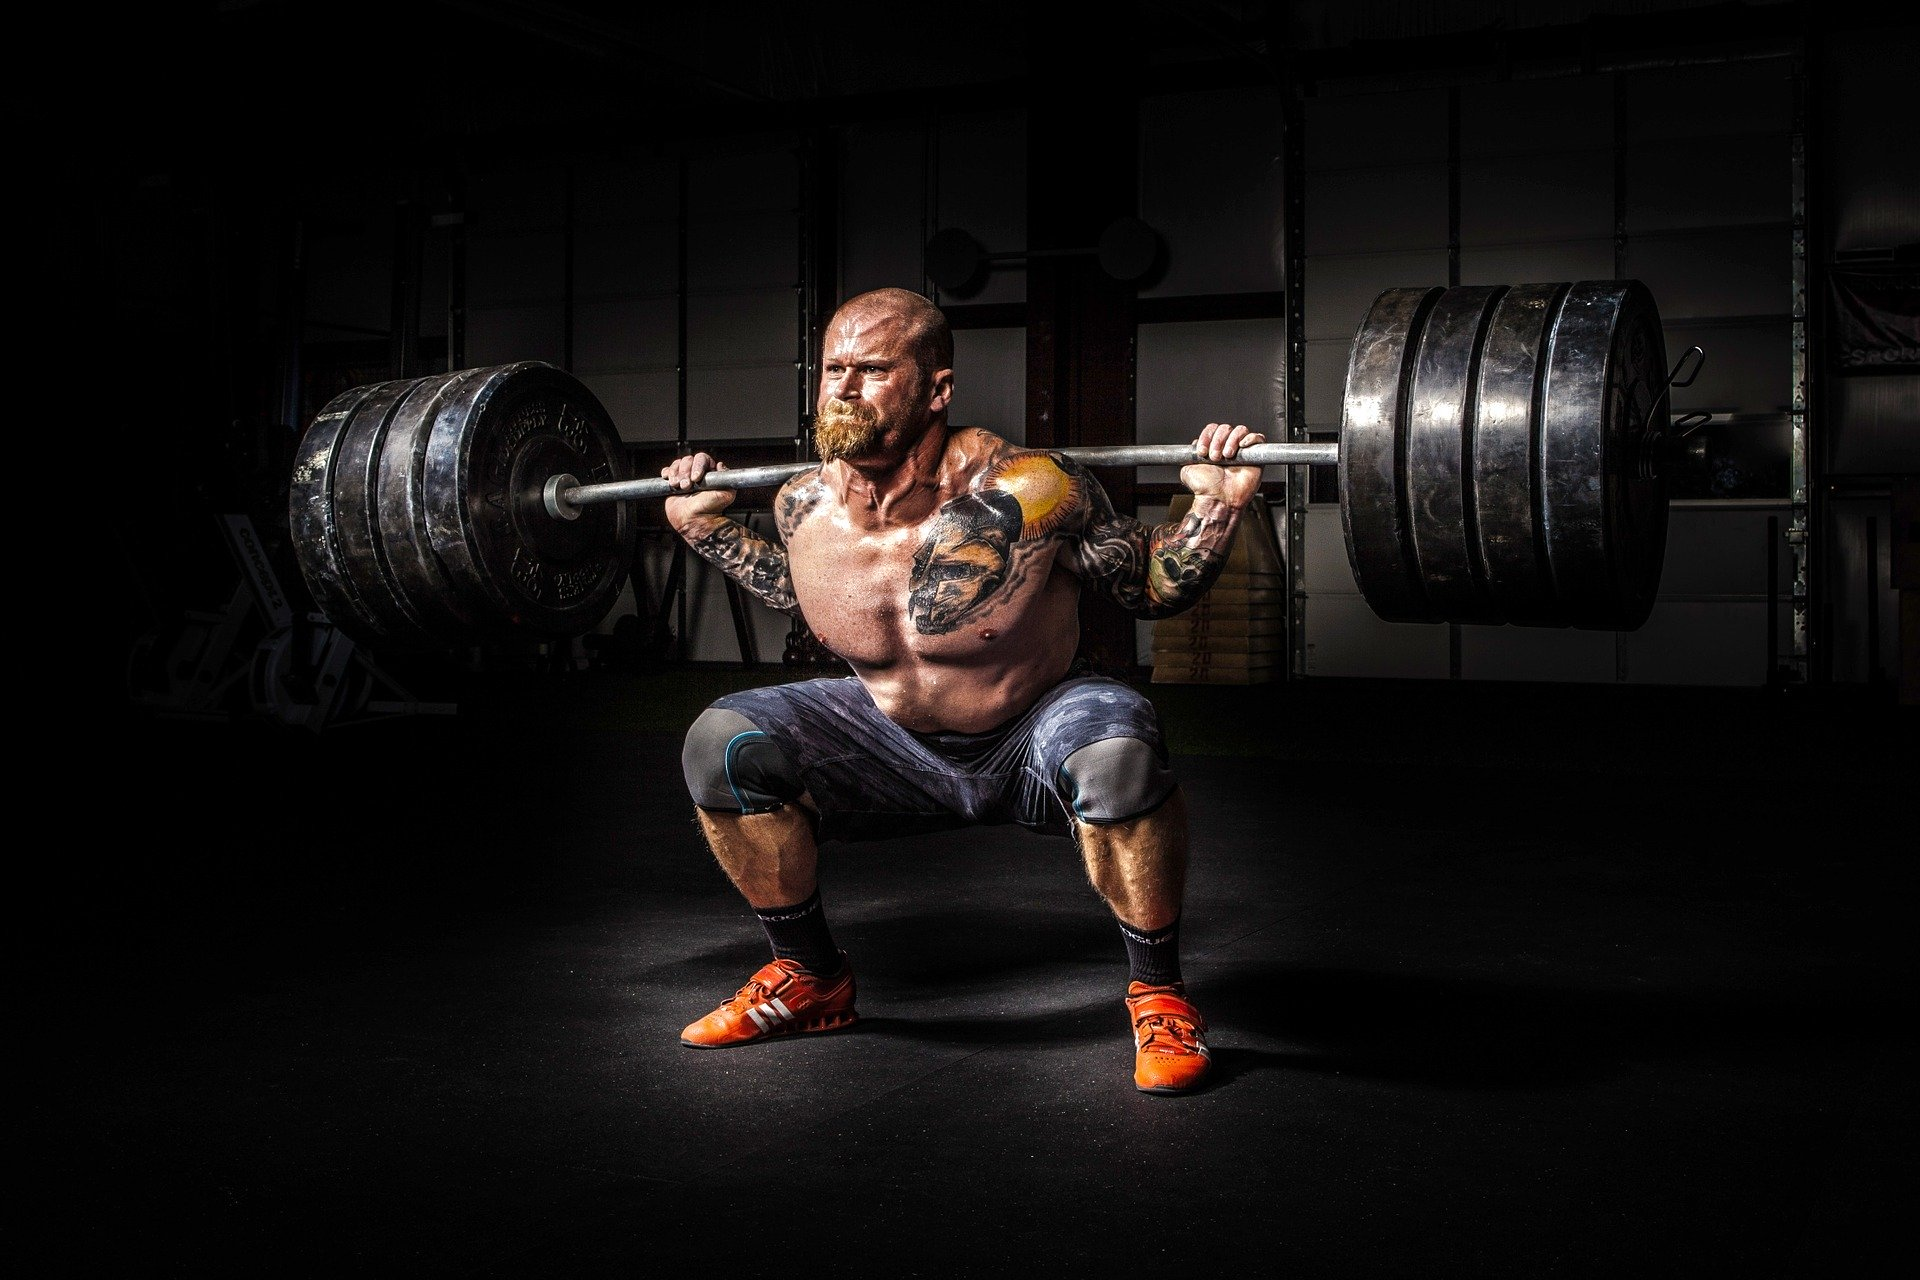 Haluatko isommat lihakset? Näin se onnistuu!